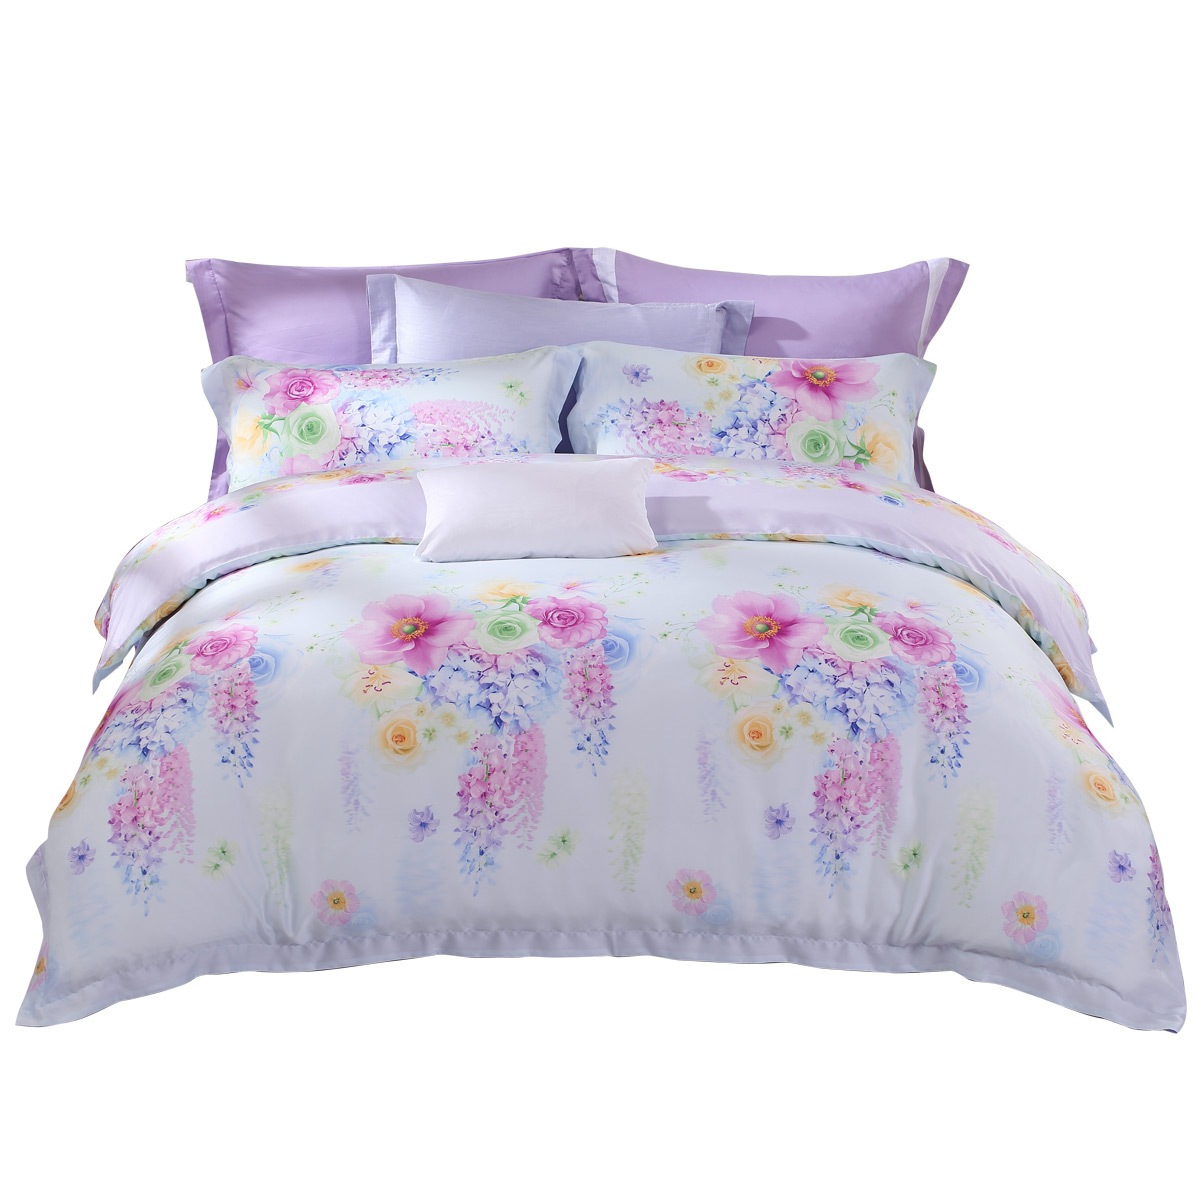 Mercury textile genuine Tencel Satin printing four pieces of 1.8 bed Lafite summer cotton satin bed 2017